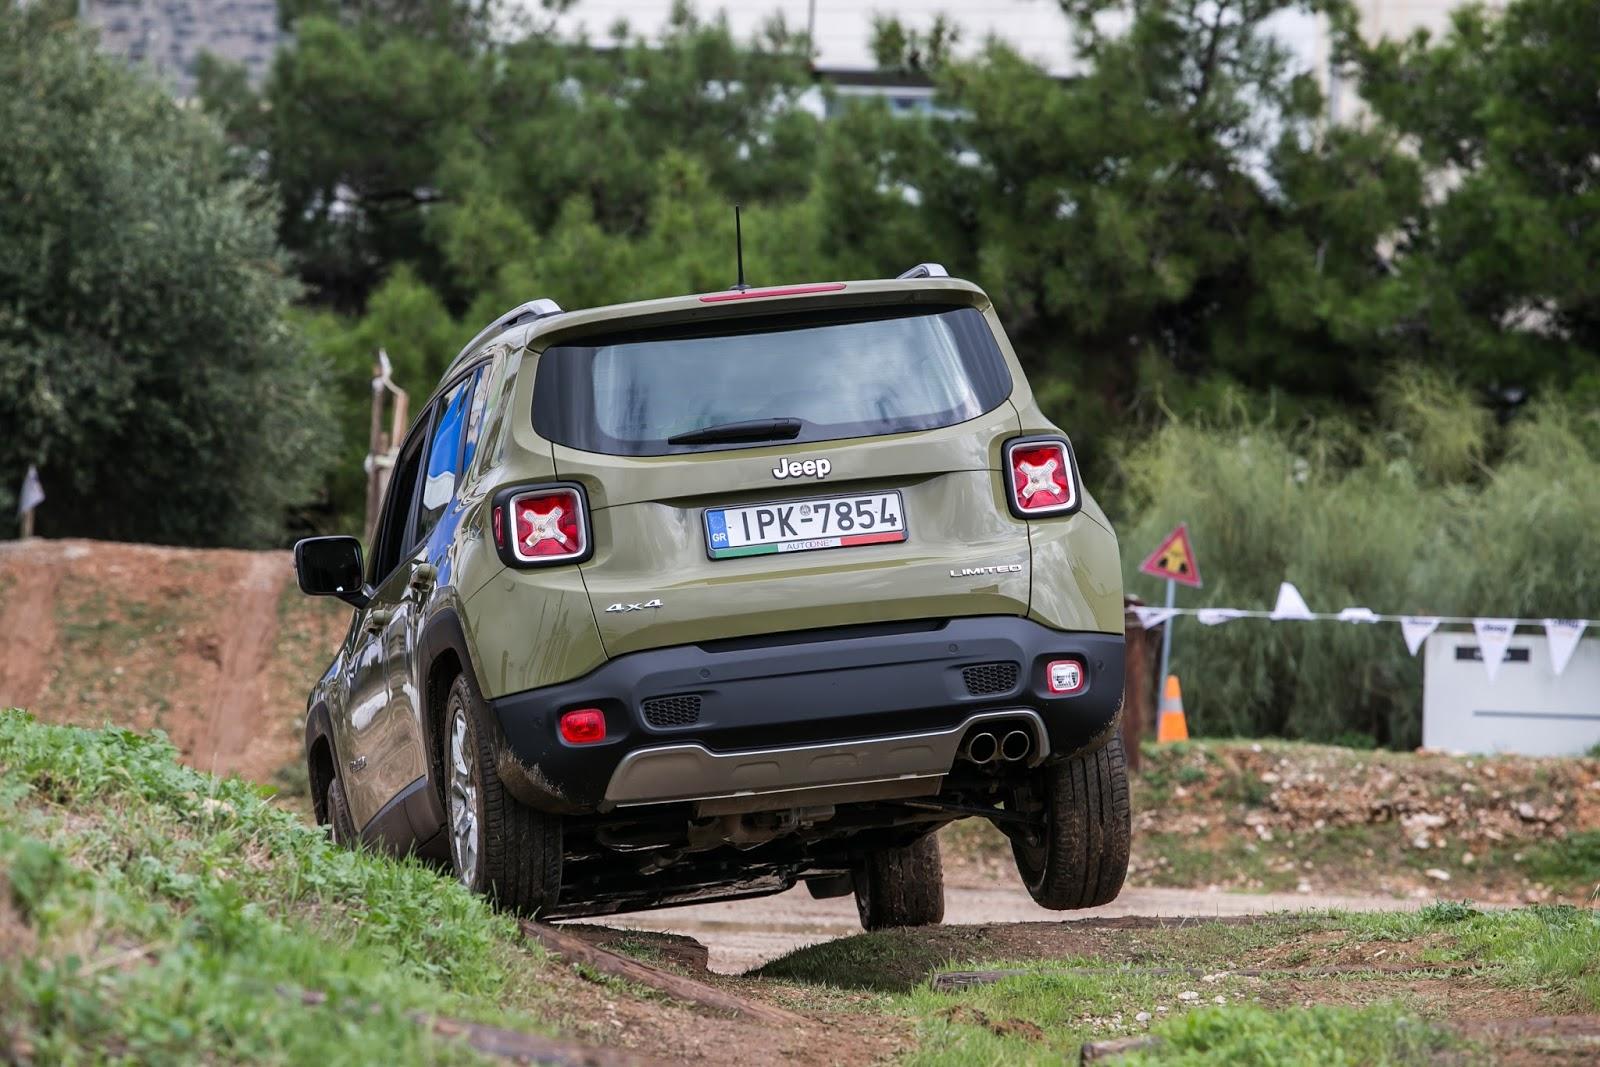 KF 1596 Πετάμε ένα Jeep Renegade σε λάσπες, πέτρες, άμμο, λίμνες. Θα τα καταφέρει; Jeep, Jeep Renegade, Renegade, SUV, TEST, zblog, ΔΟΚΙΜΕΣ